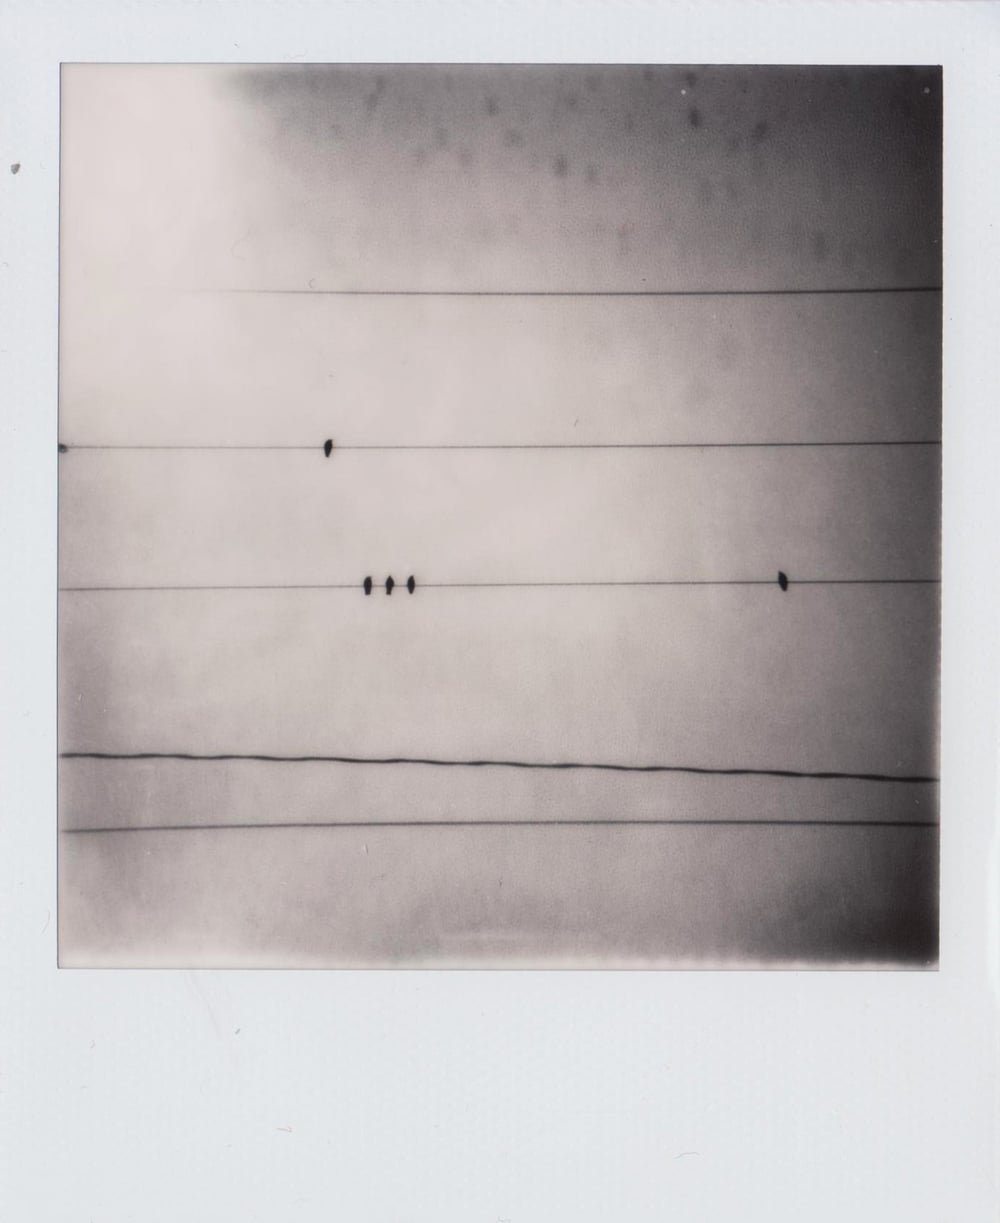 The Hotel | Polaroid SX-70 | Abigail Crone